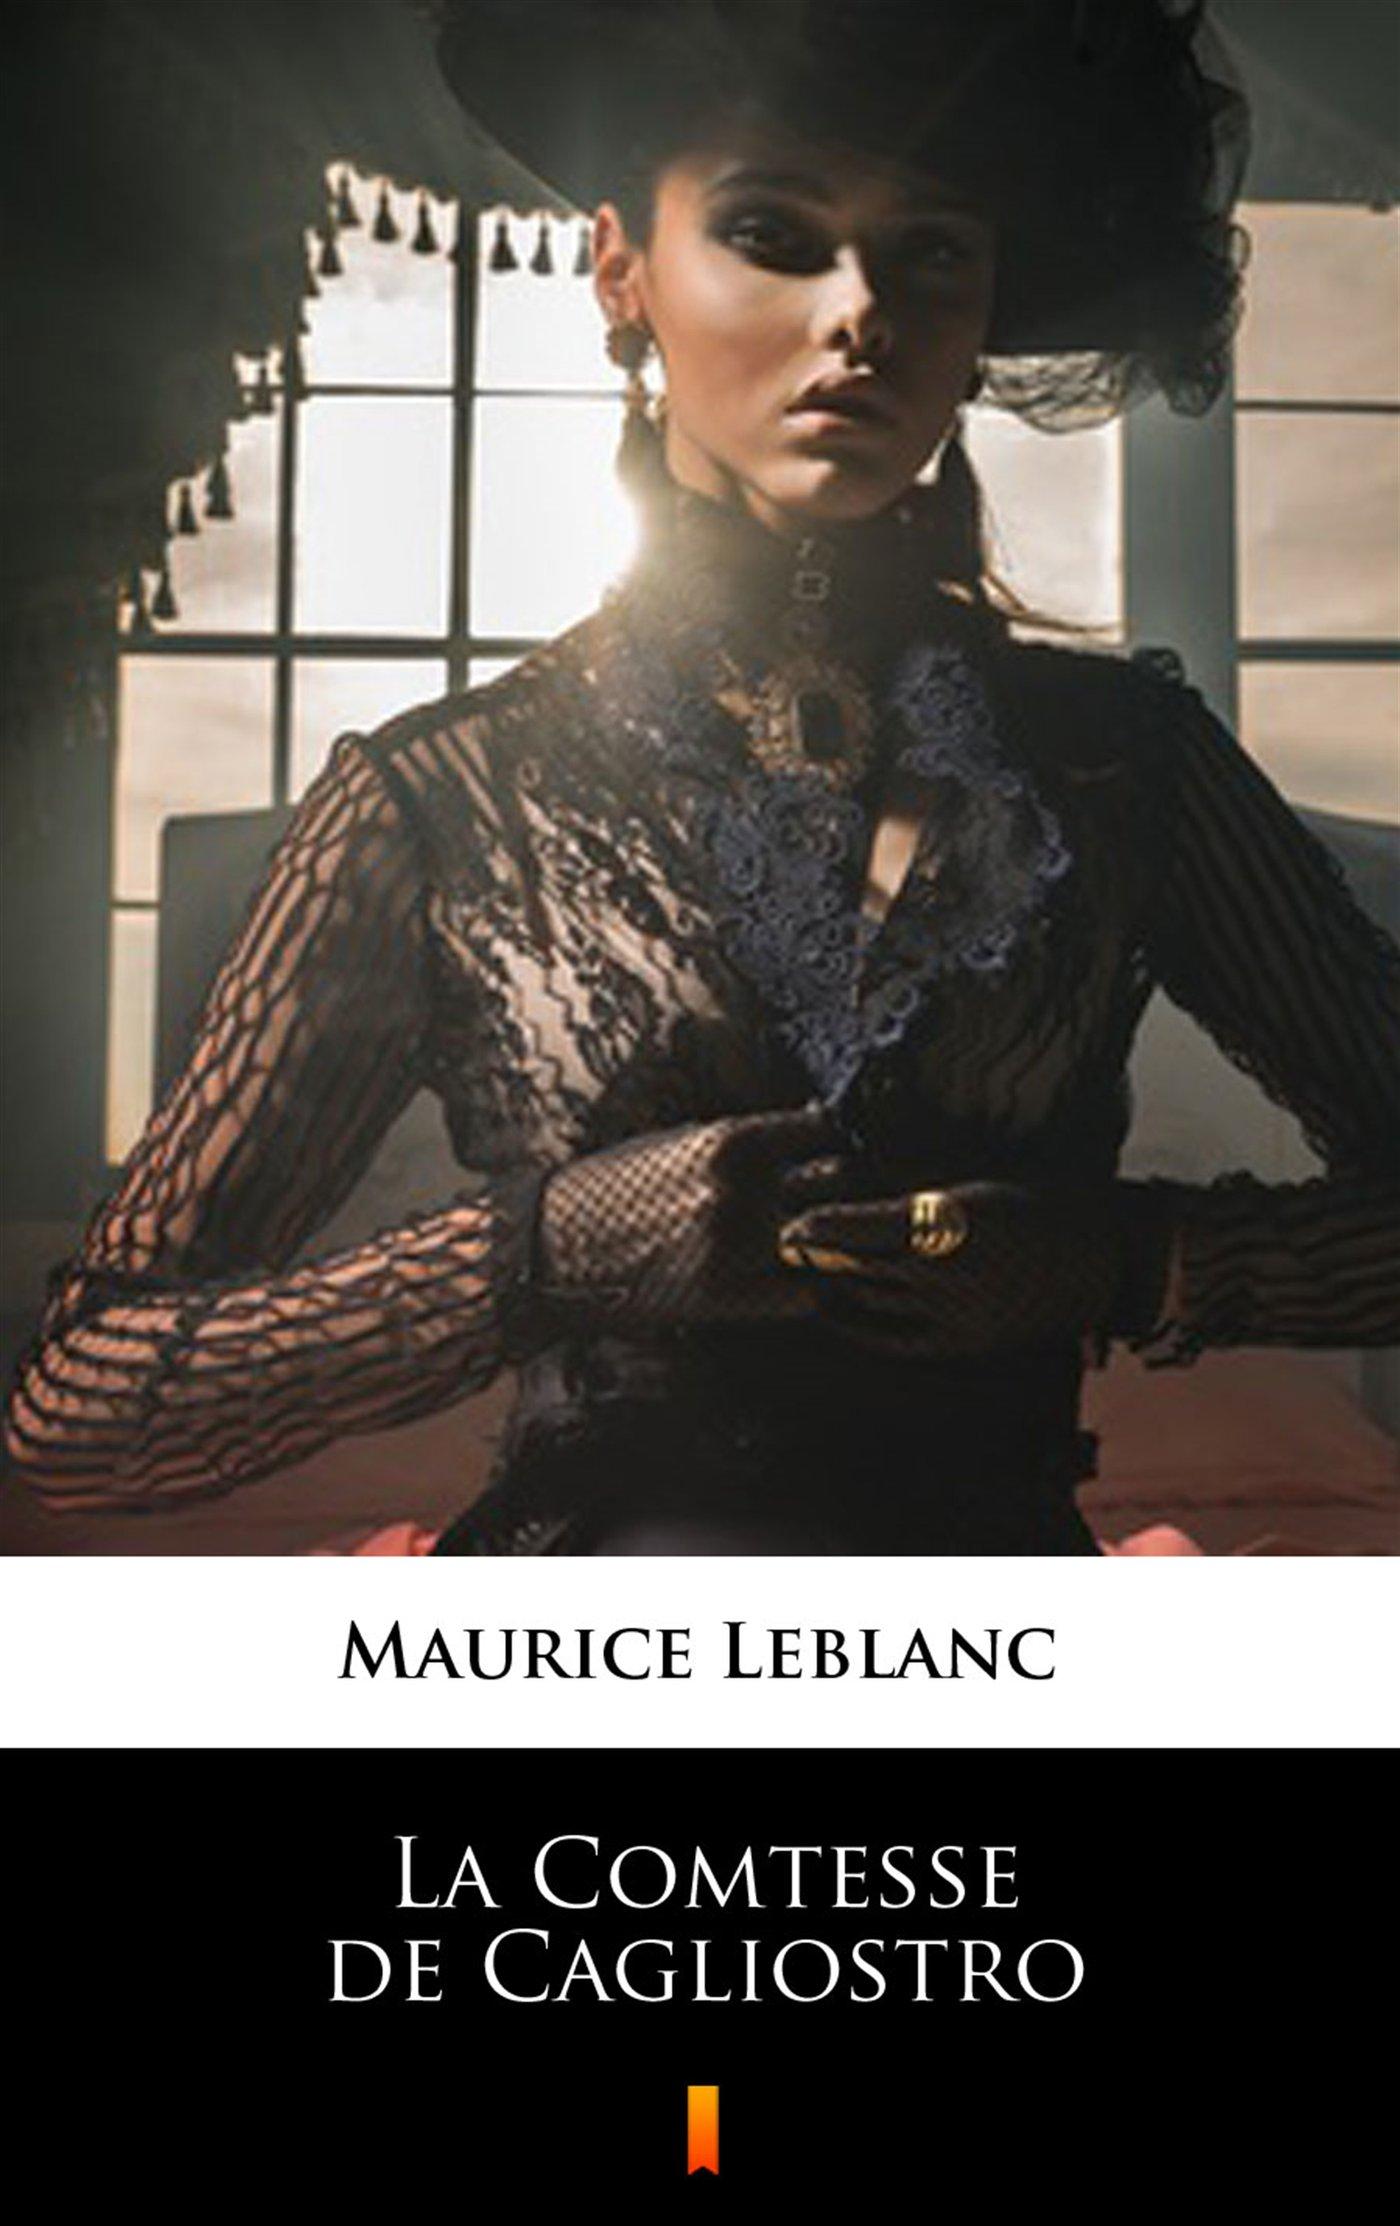 La Comtesse de Cagliostro - Ebook (Książka na Kindle) do pobrania w formacie MOBI